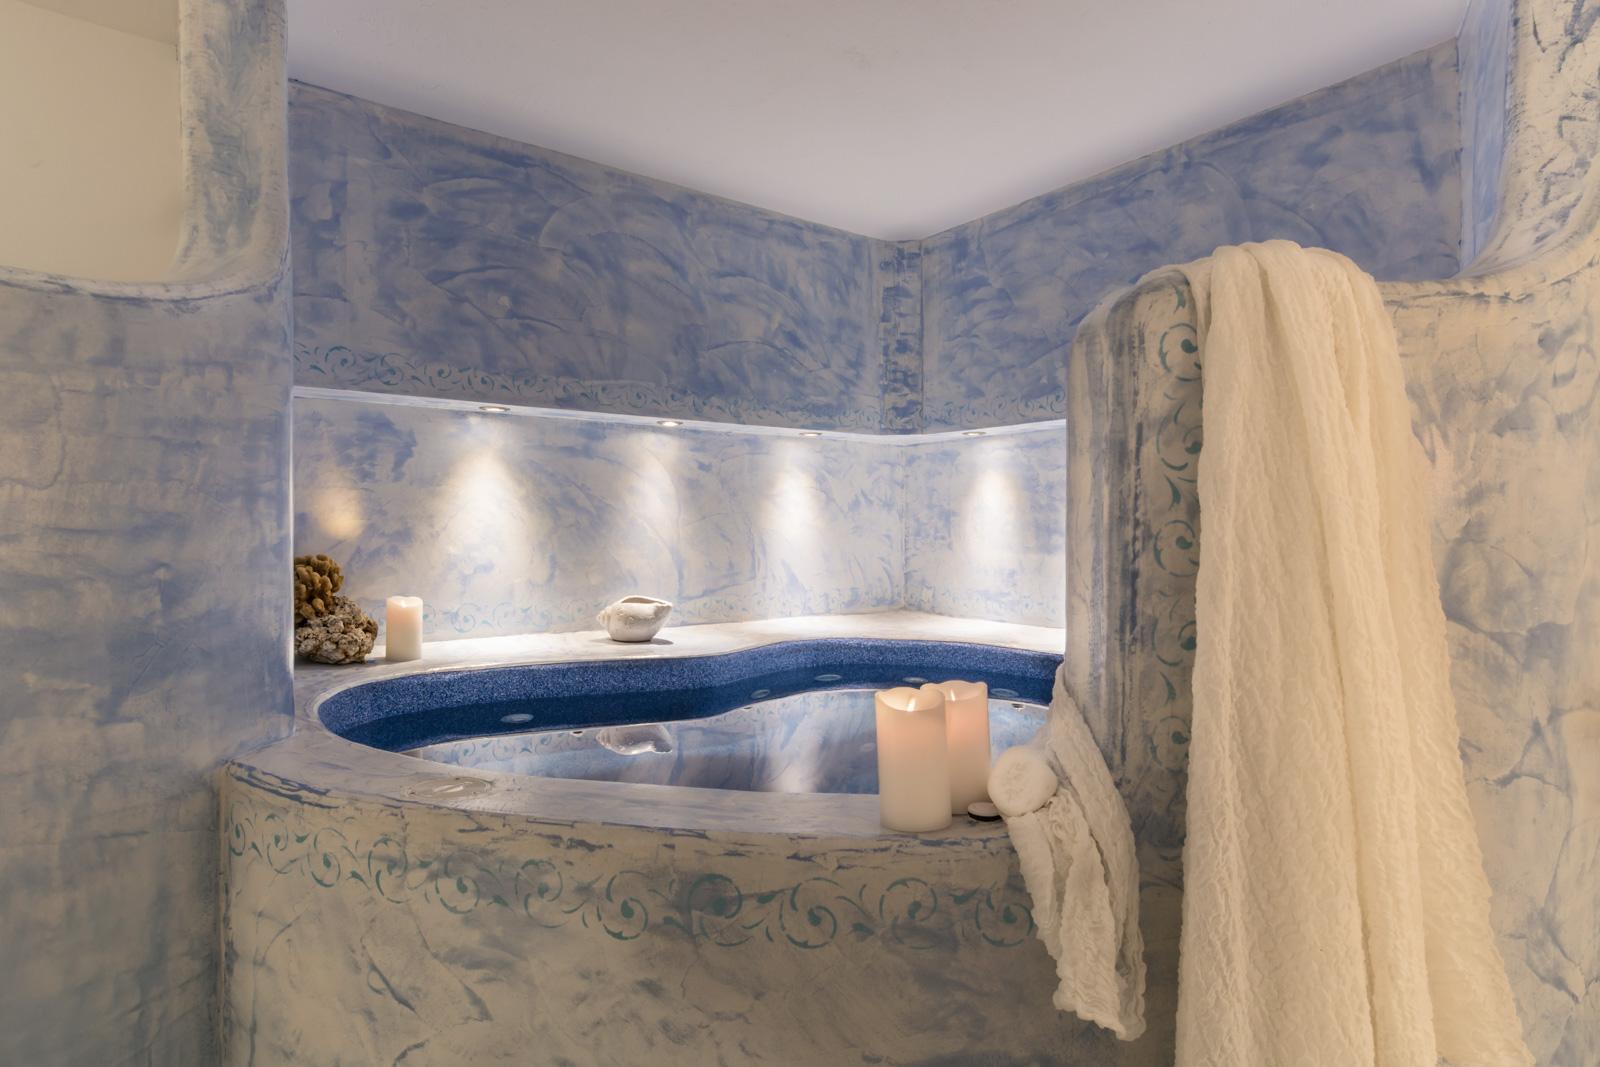 santorini villas 5 bedrooms jacuzzi